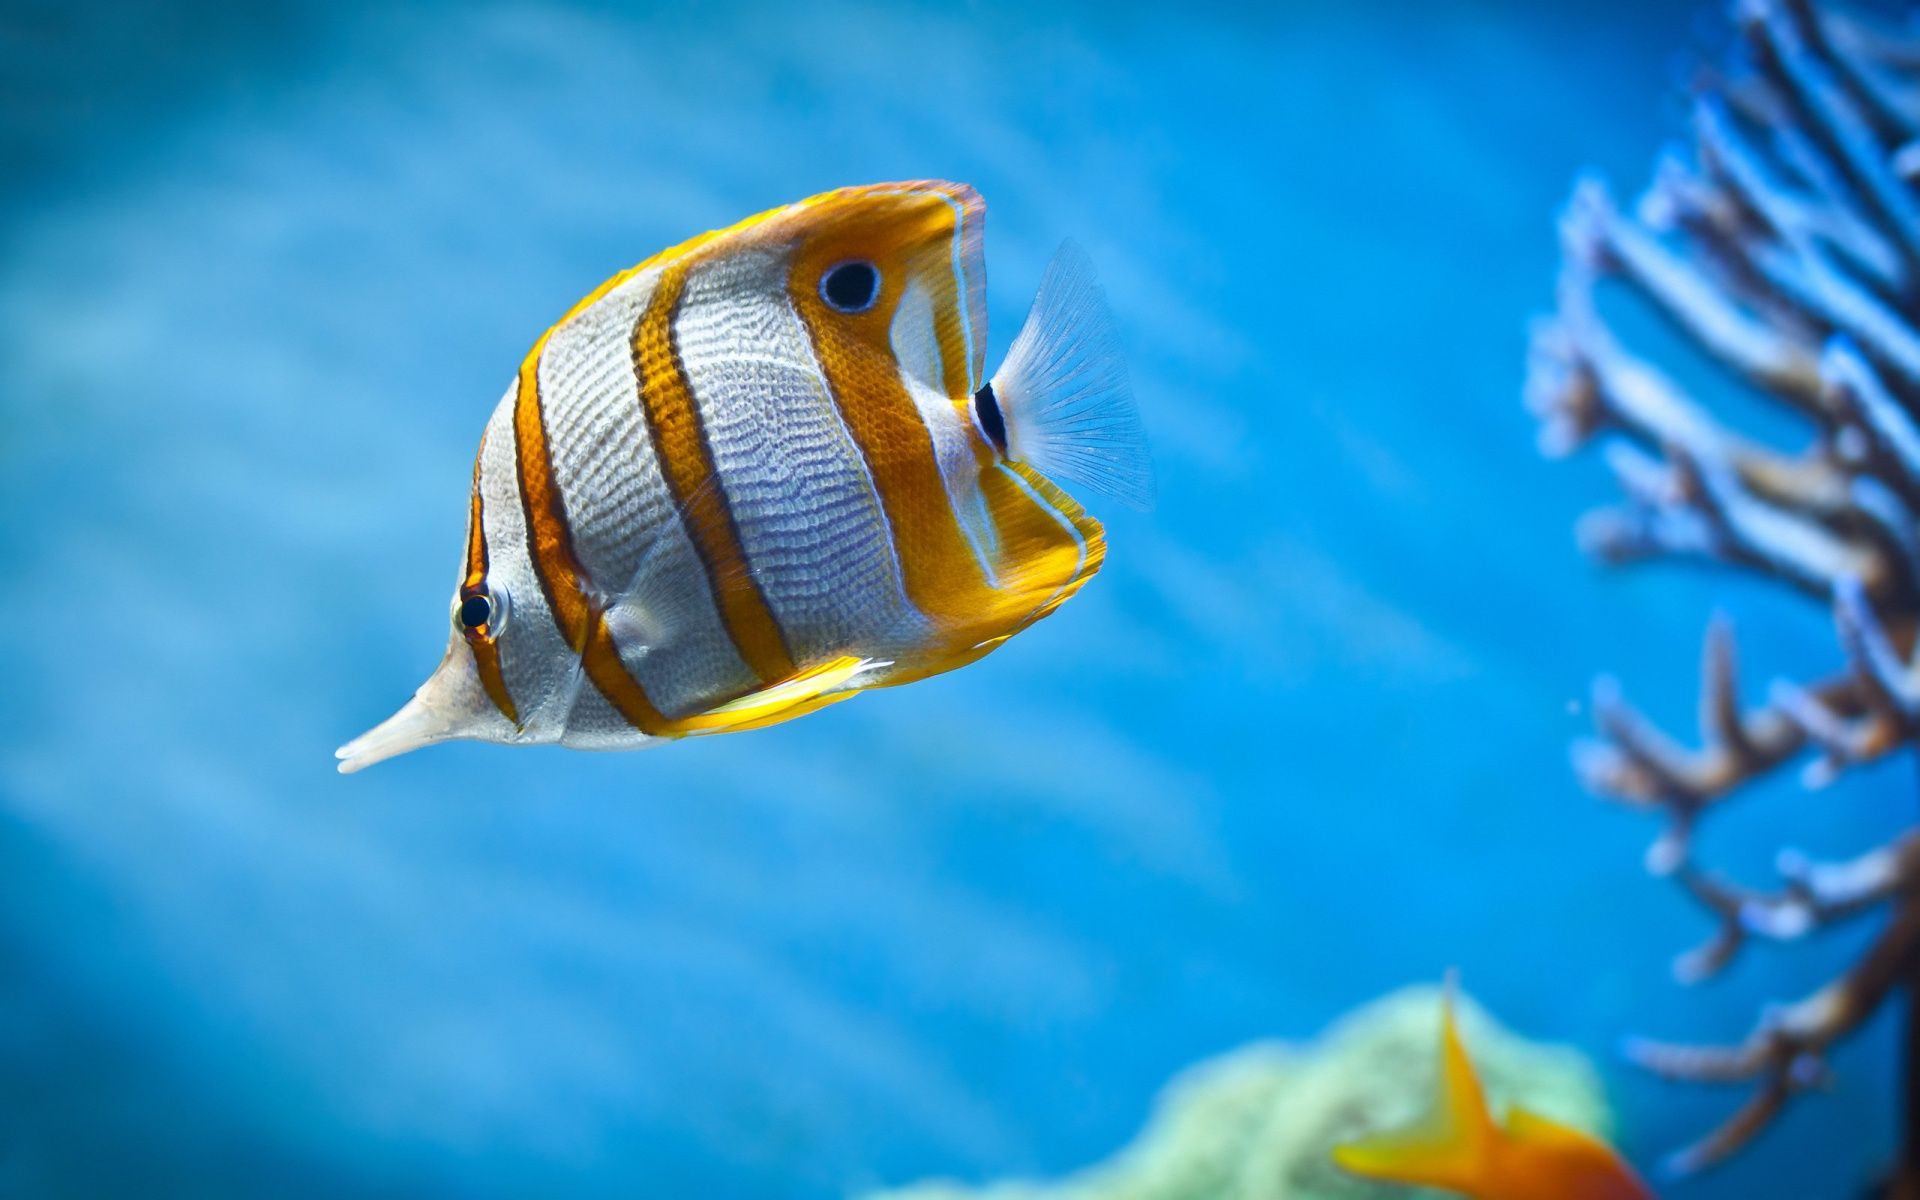 Fish Full HD Quality Images Desktop Live Wallpaper Free 512x512 Underwater CreaturesUnderwater